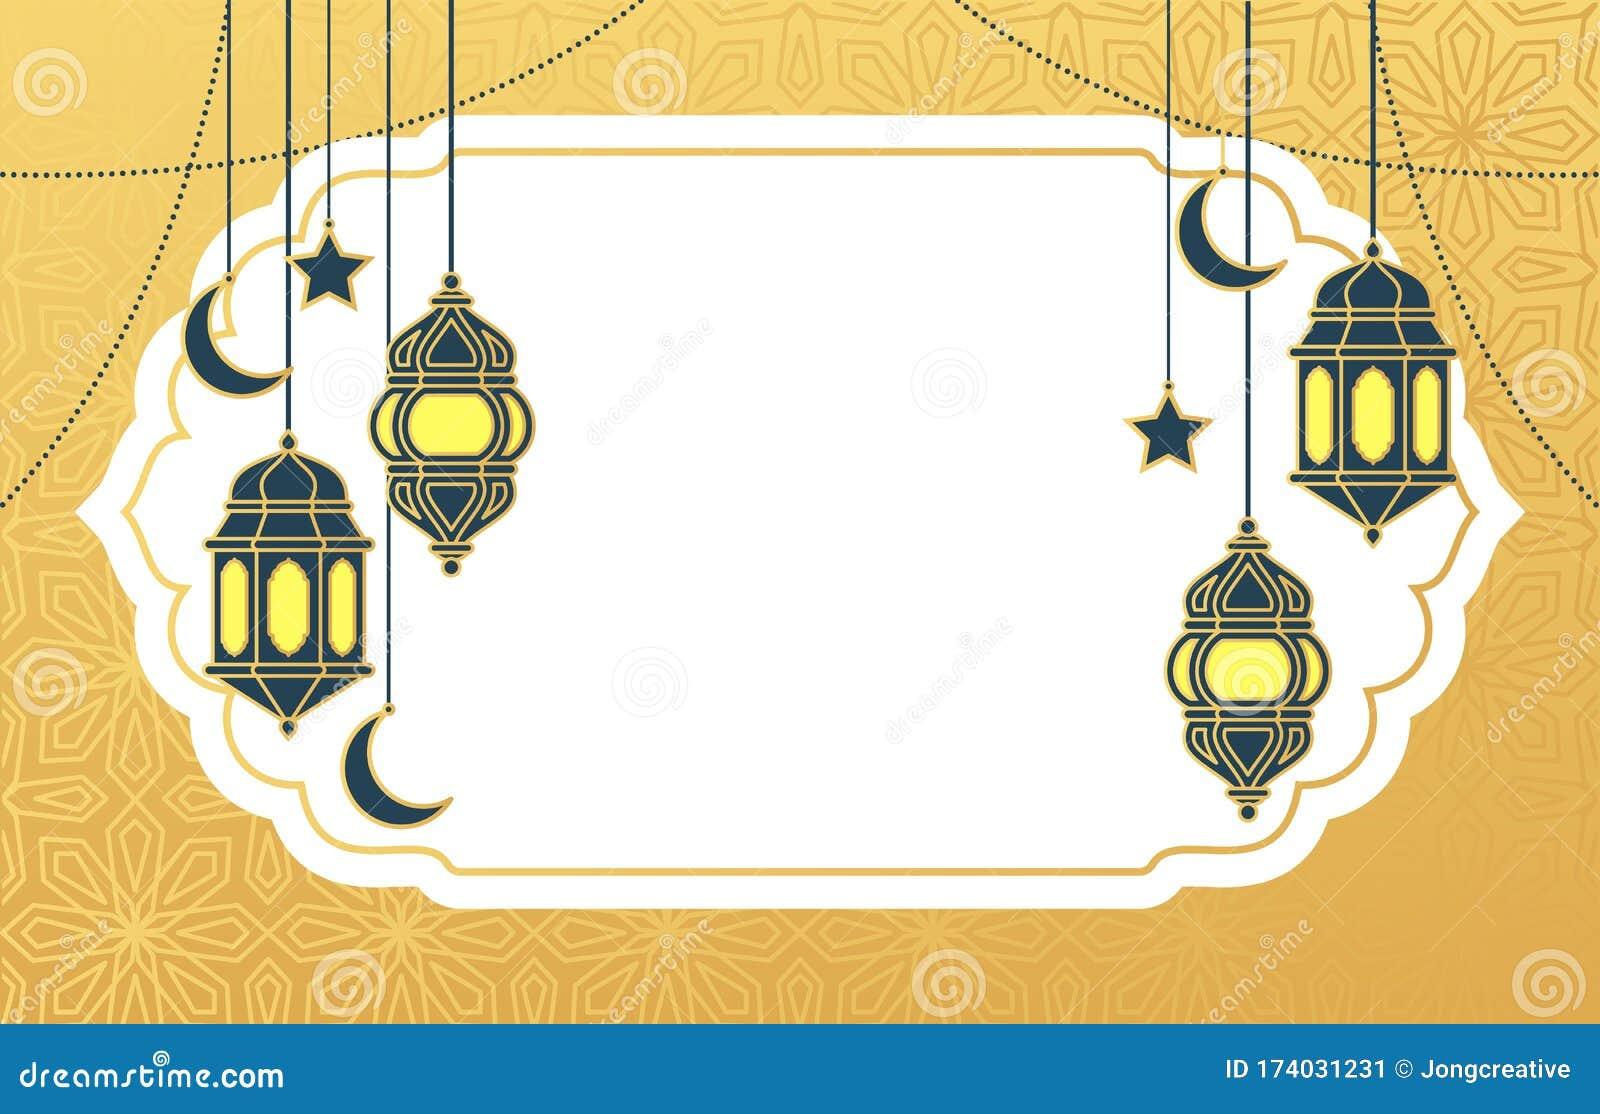 Islamic Arabic Lantern For Ramadan Kareem Eid Mubarak Background Stock Vector Illustration Of Hanging Holy 174031231